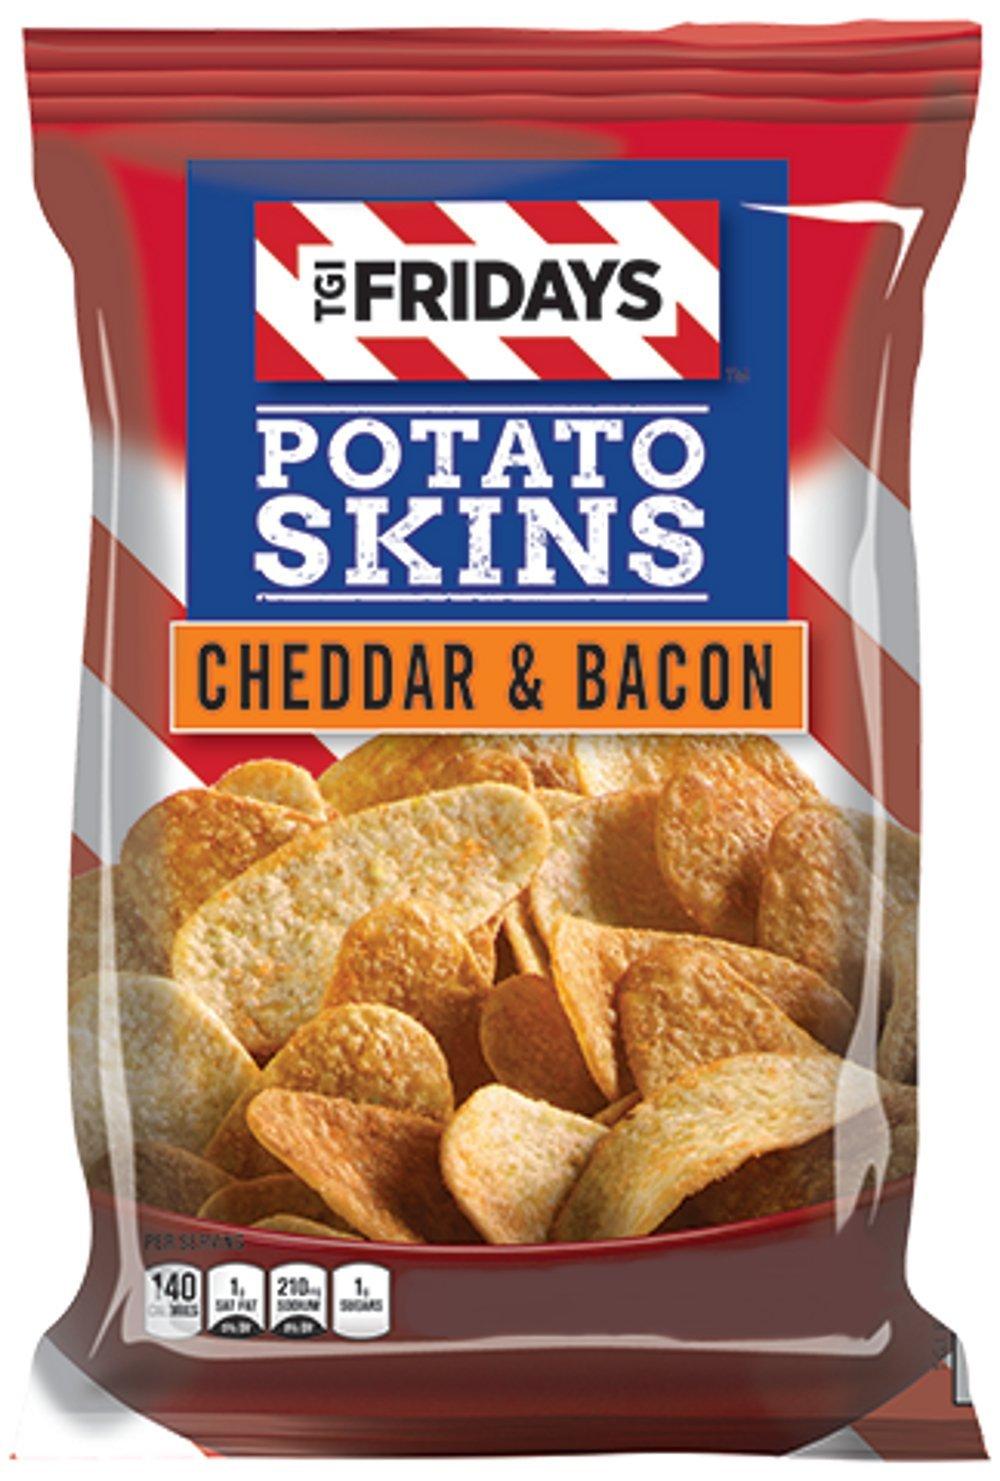 TGI Fridays Potato Skins Perks